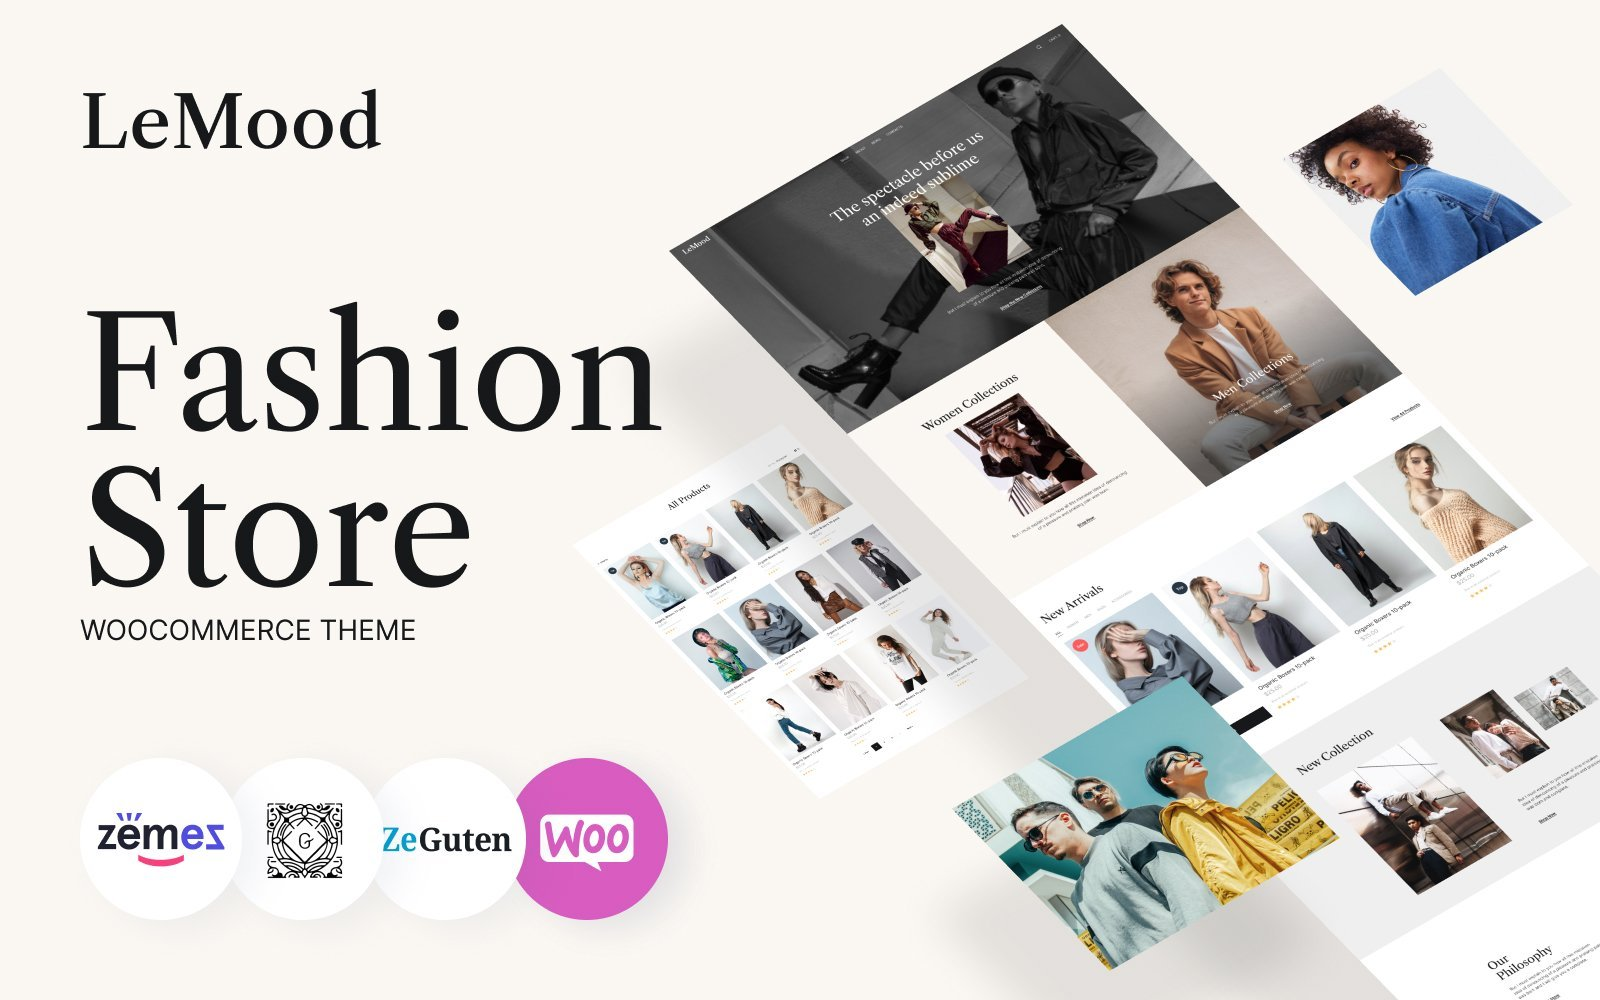 Fastest WooCommerce themes LeMood